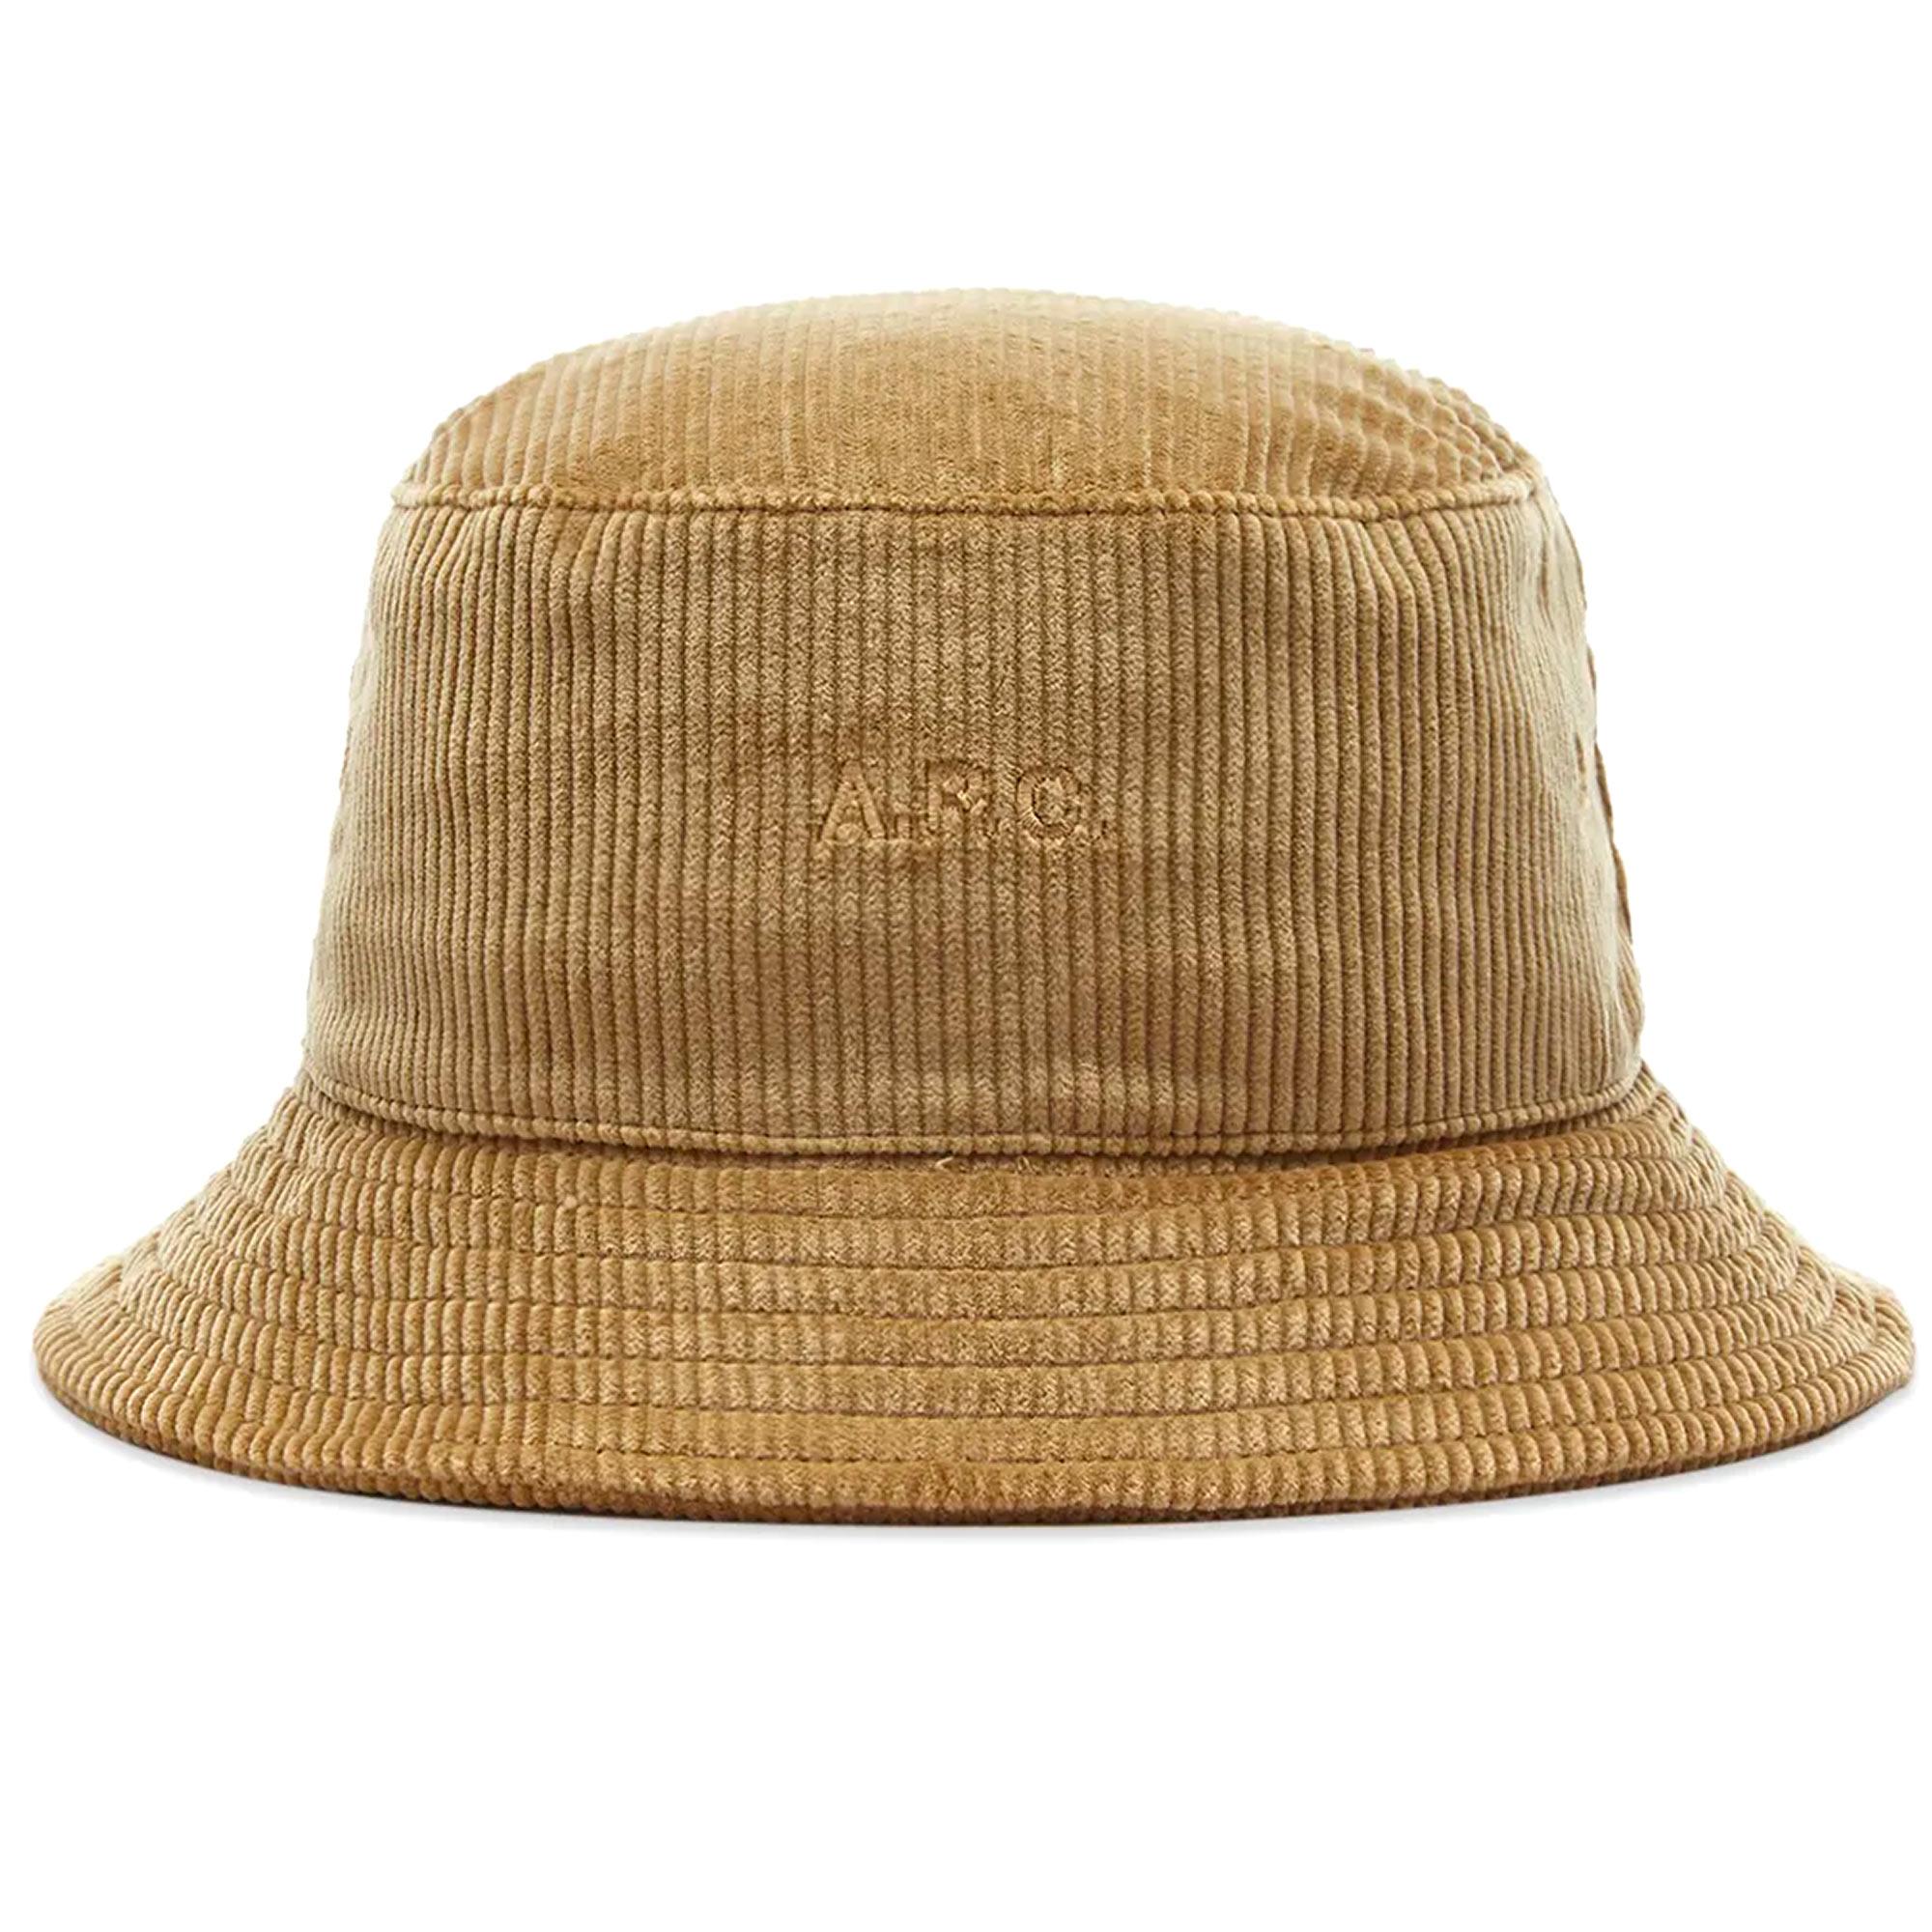 A.P.C Bucket Hat